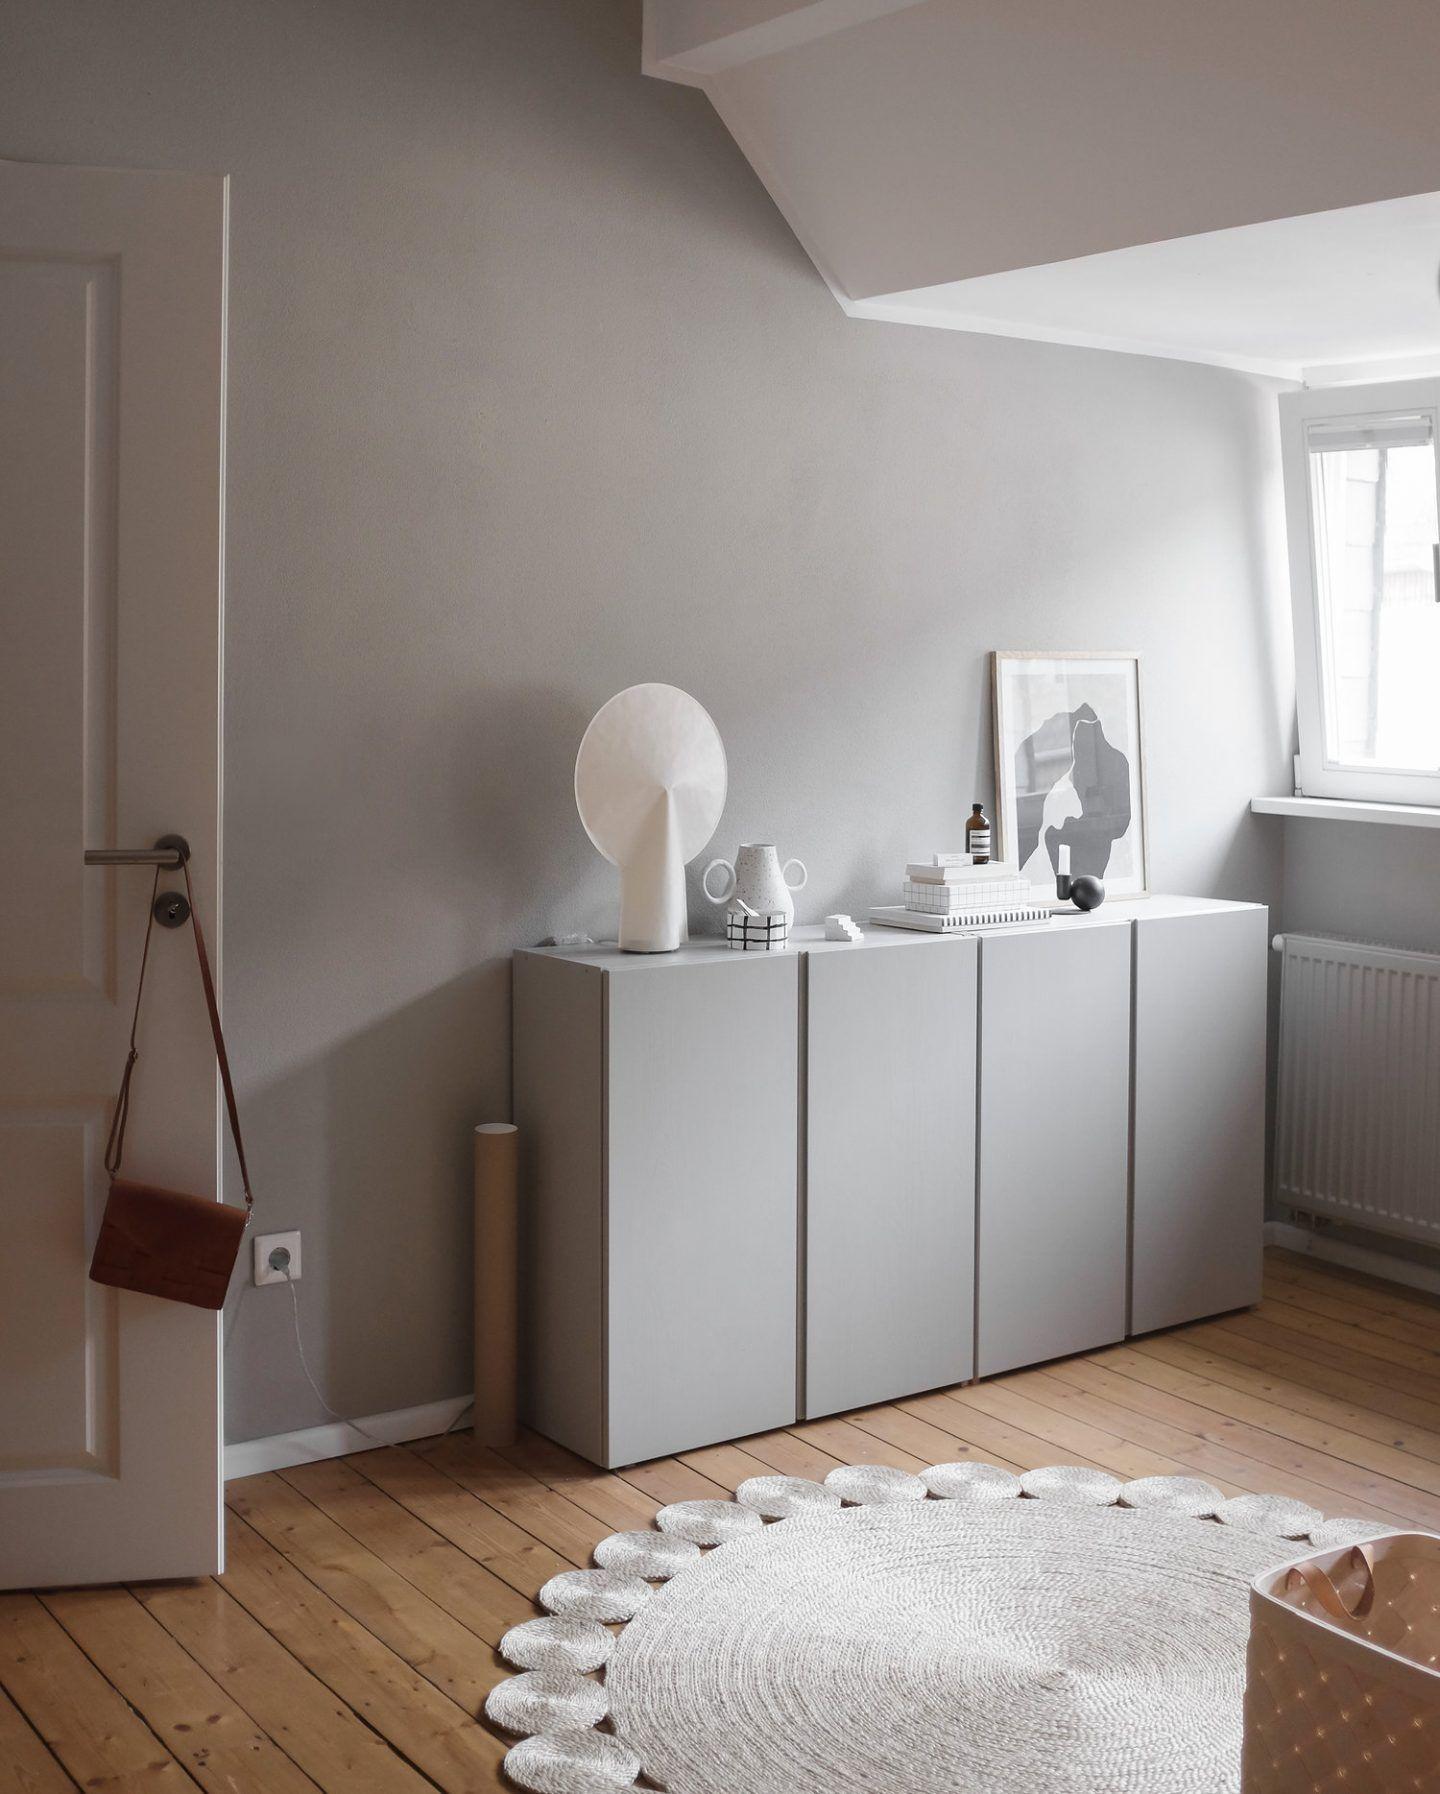 Photo of Peek Inside The Creative and Joyful Home Of A Scandinavian D